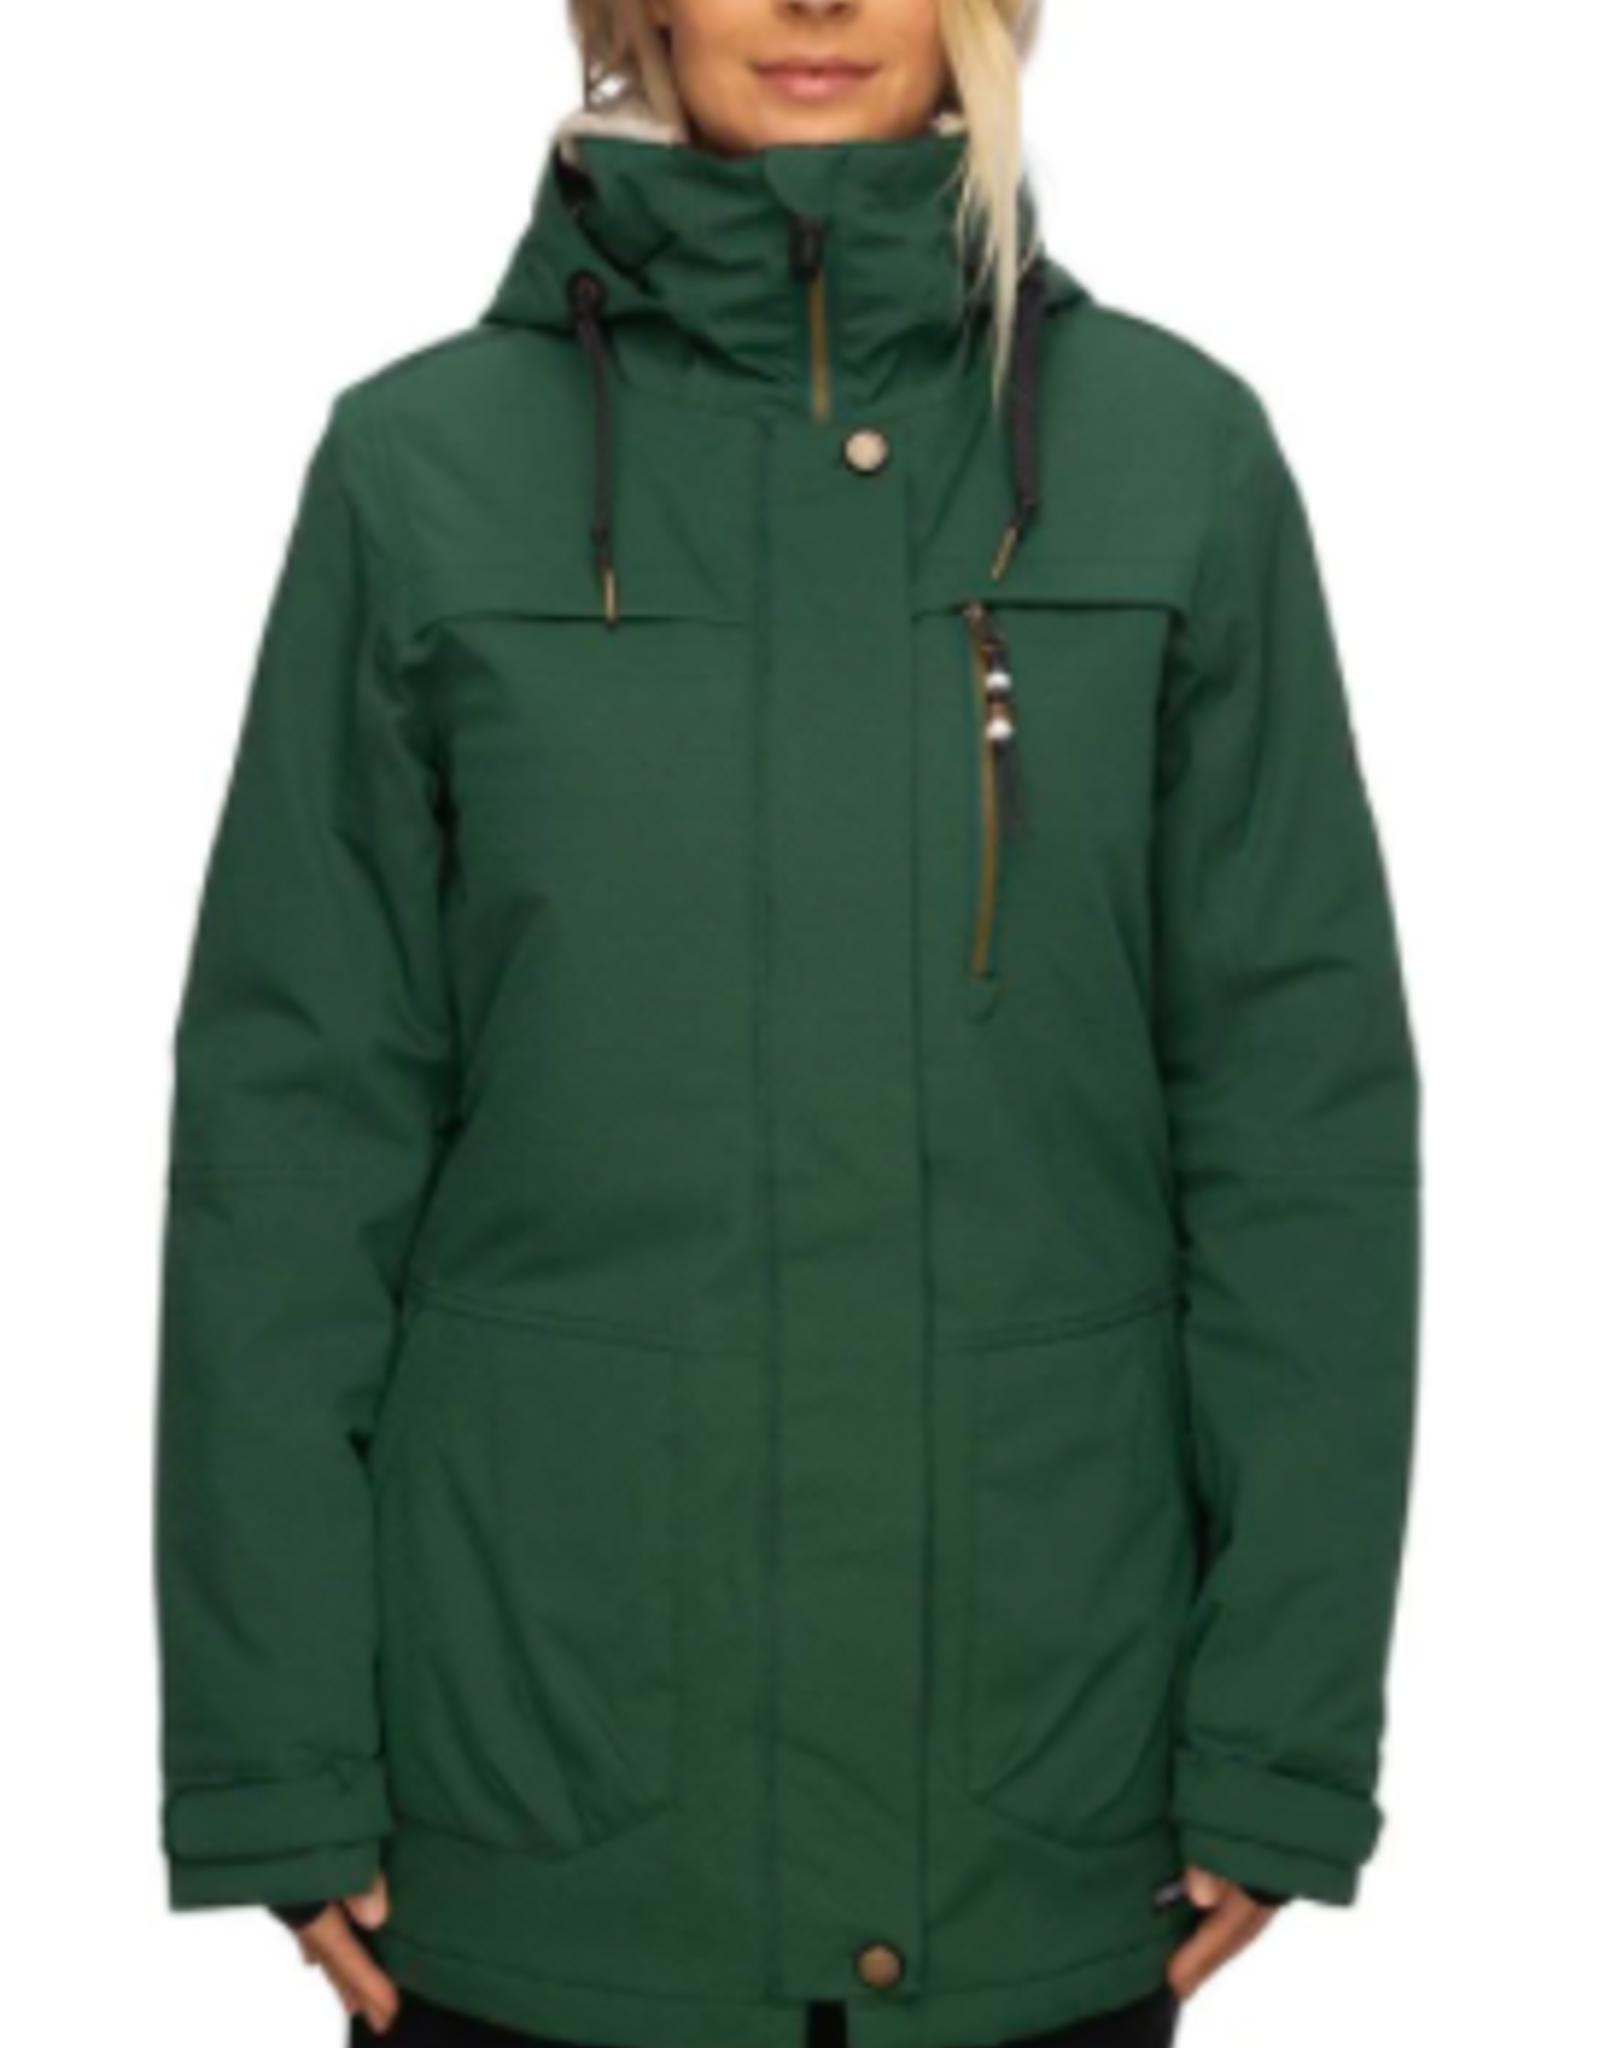 686 Women's Spirit Insulated Jacket Pine Green Geo Jacquard 2022